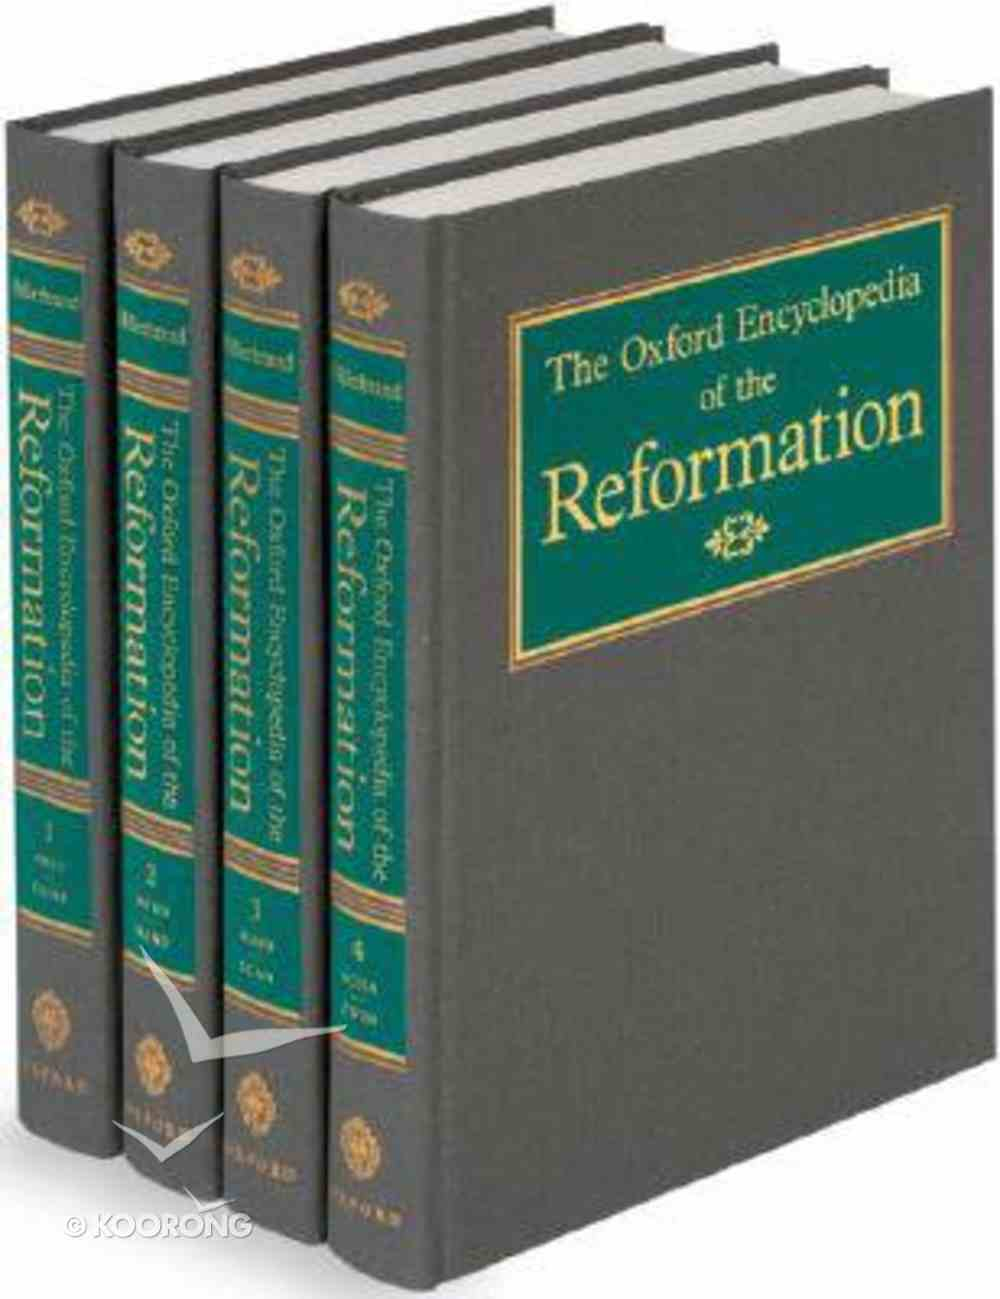 Oxford Encyclopedia of the Reformation 4v Hardback